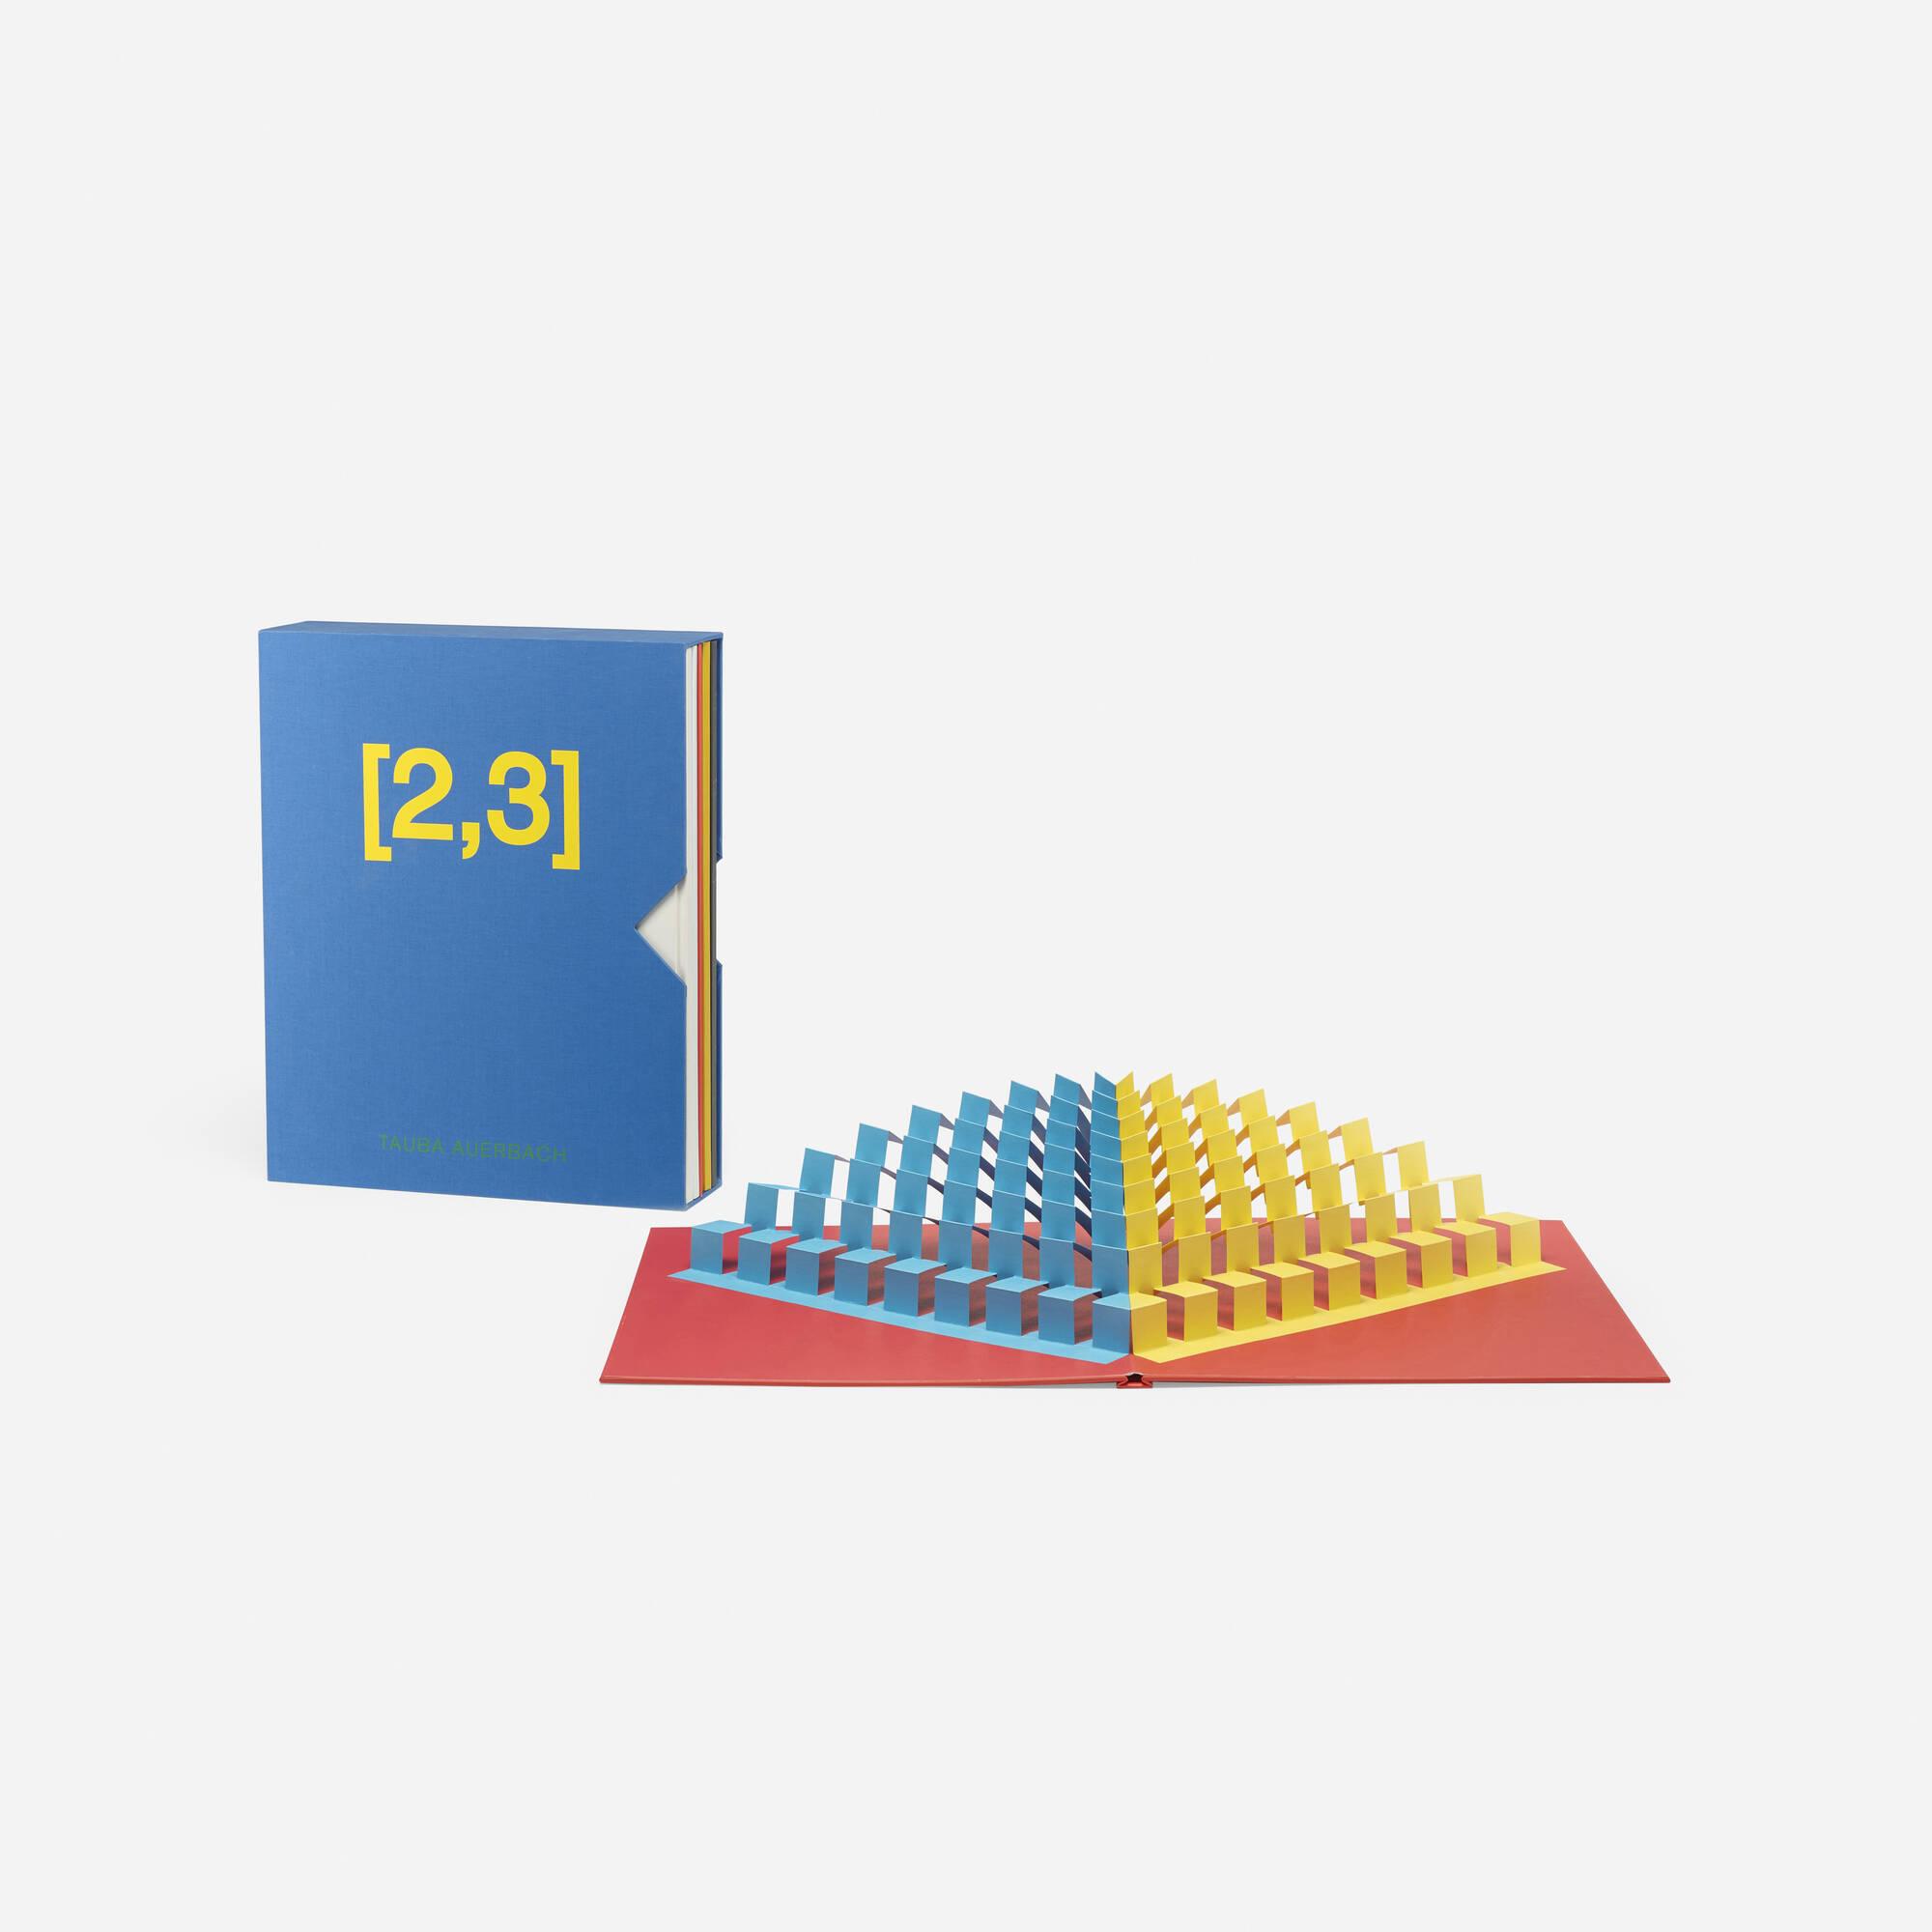 288: Tauba Auerbach / [2,3] (1 of 3)